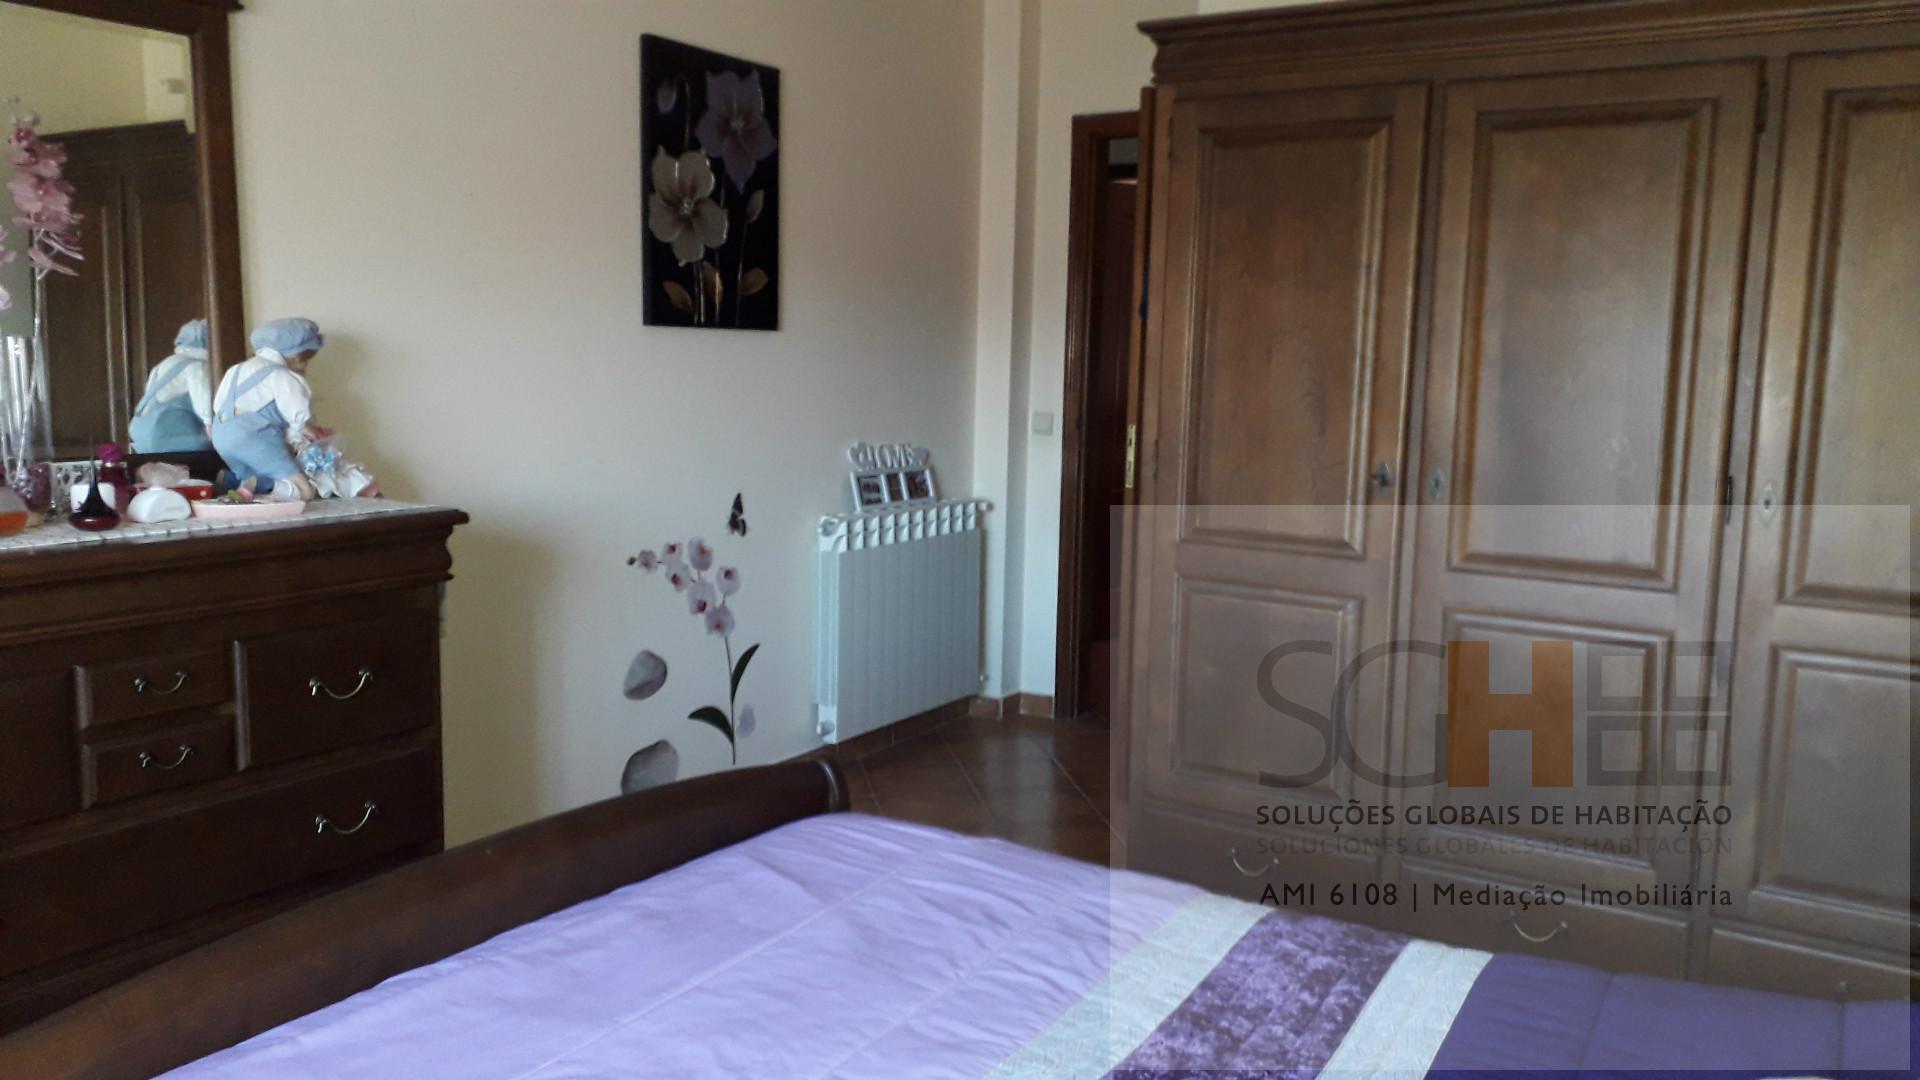 Zweifamilienhaus 3 Schlafzimmer, Castelo Branco, Castelo Branco